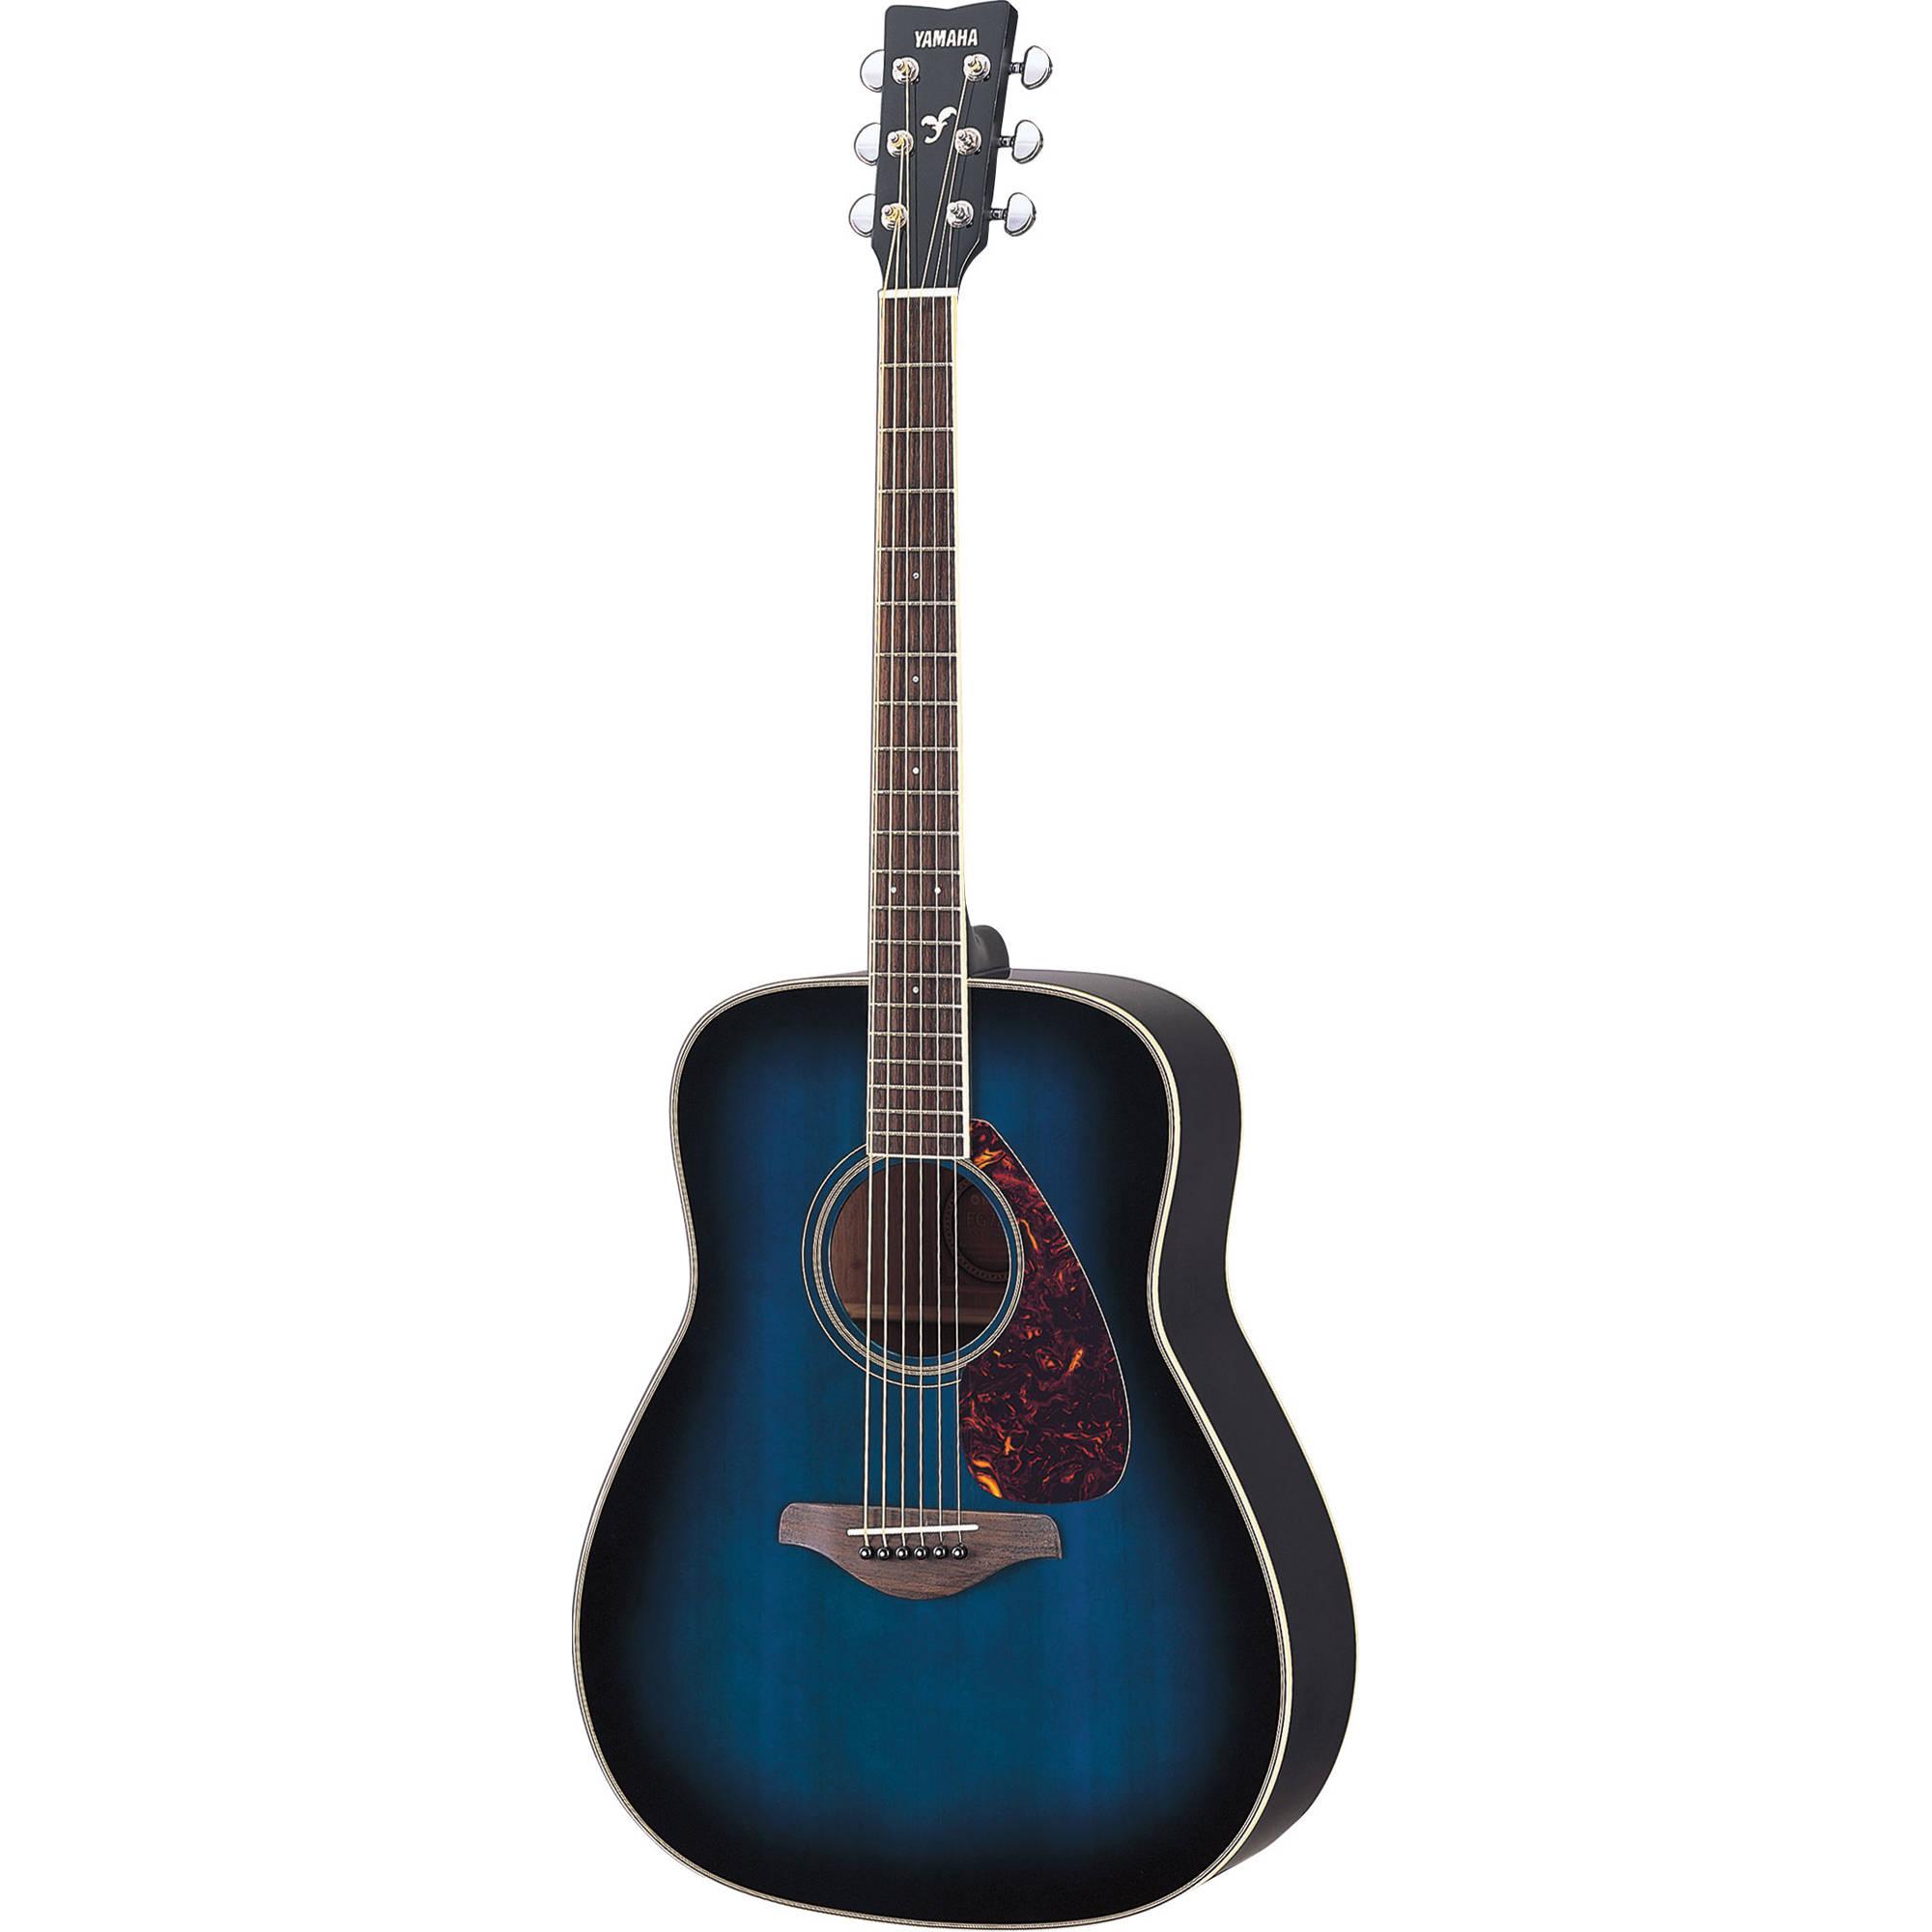 Yamaha FG720S Solid-Top Acoustic Guitar FG720S OBB B&H Photo